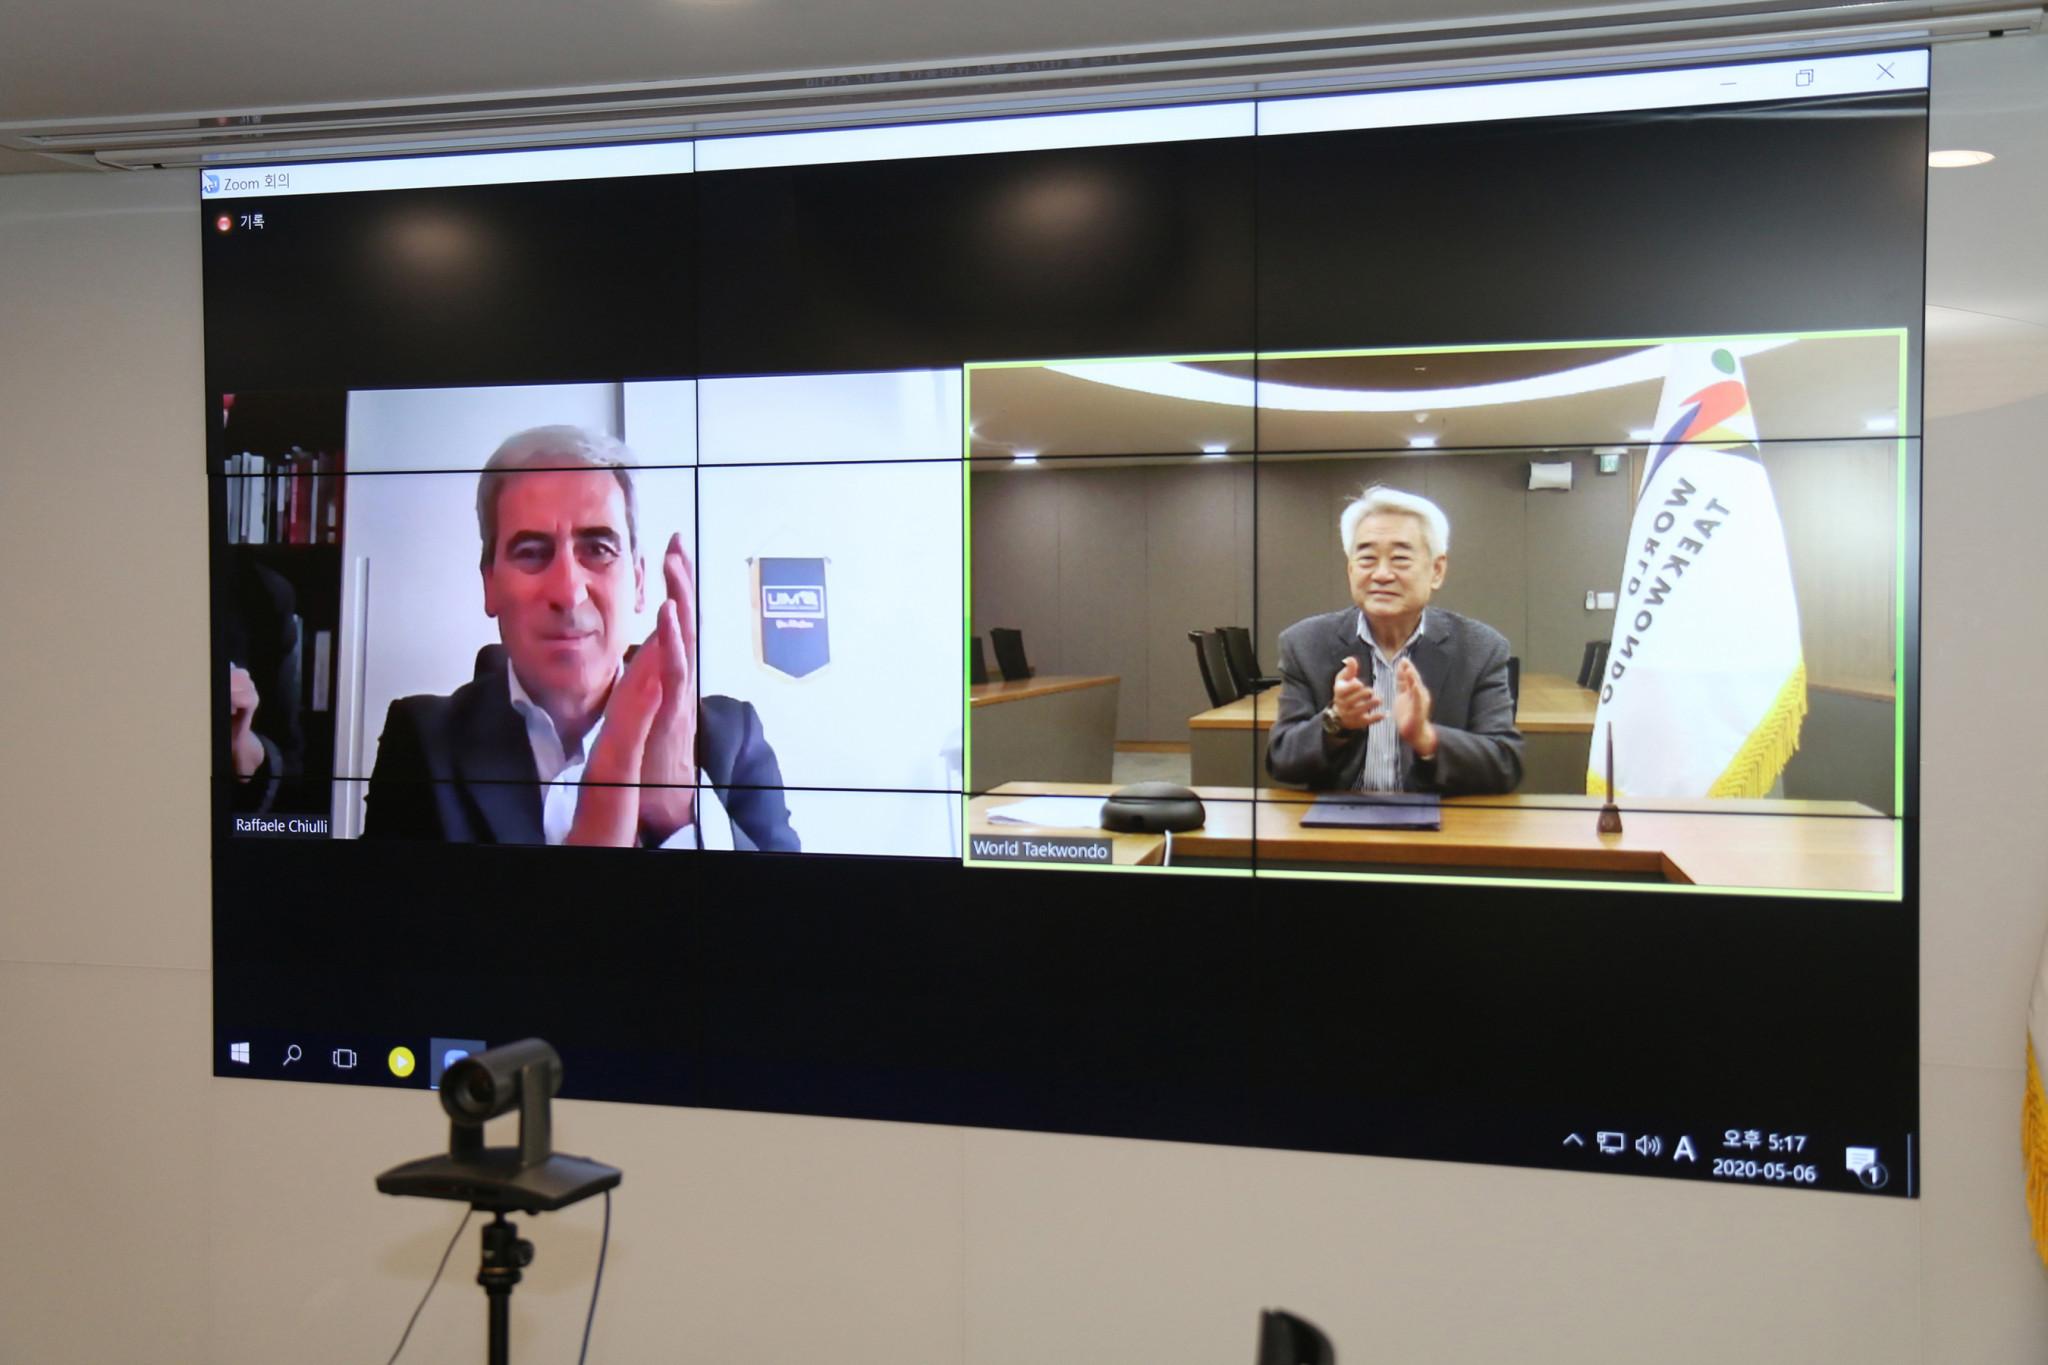 WT and THF President Choue Chung-won and UIM President Raffaele Chiulli met online ©WT